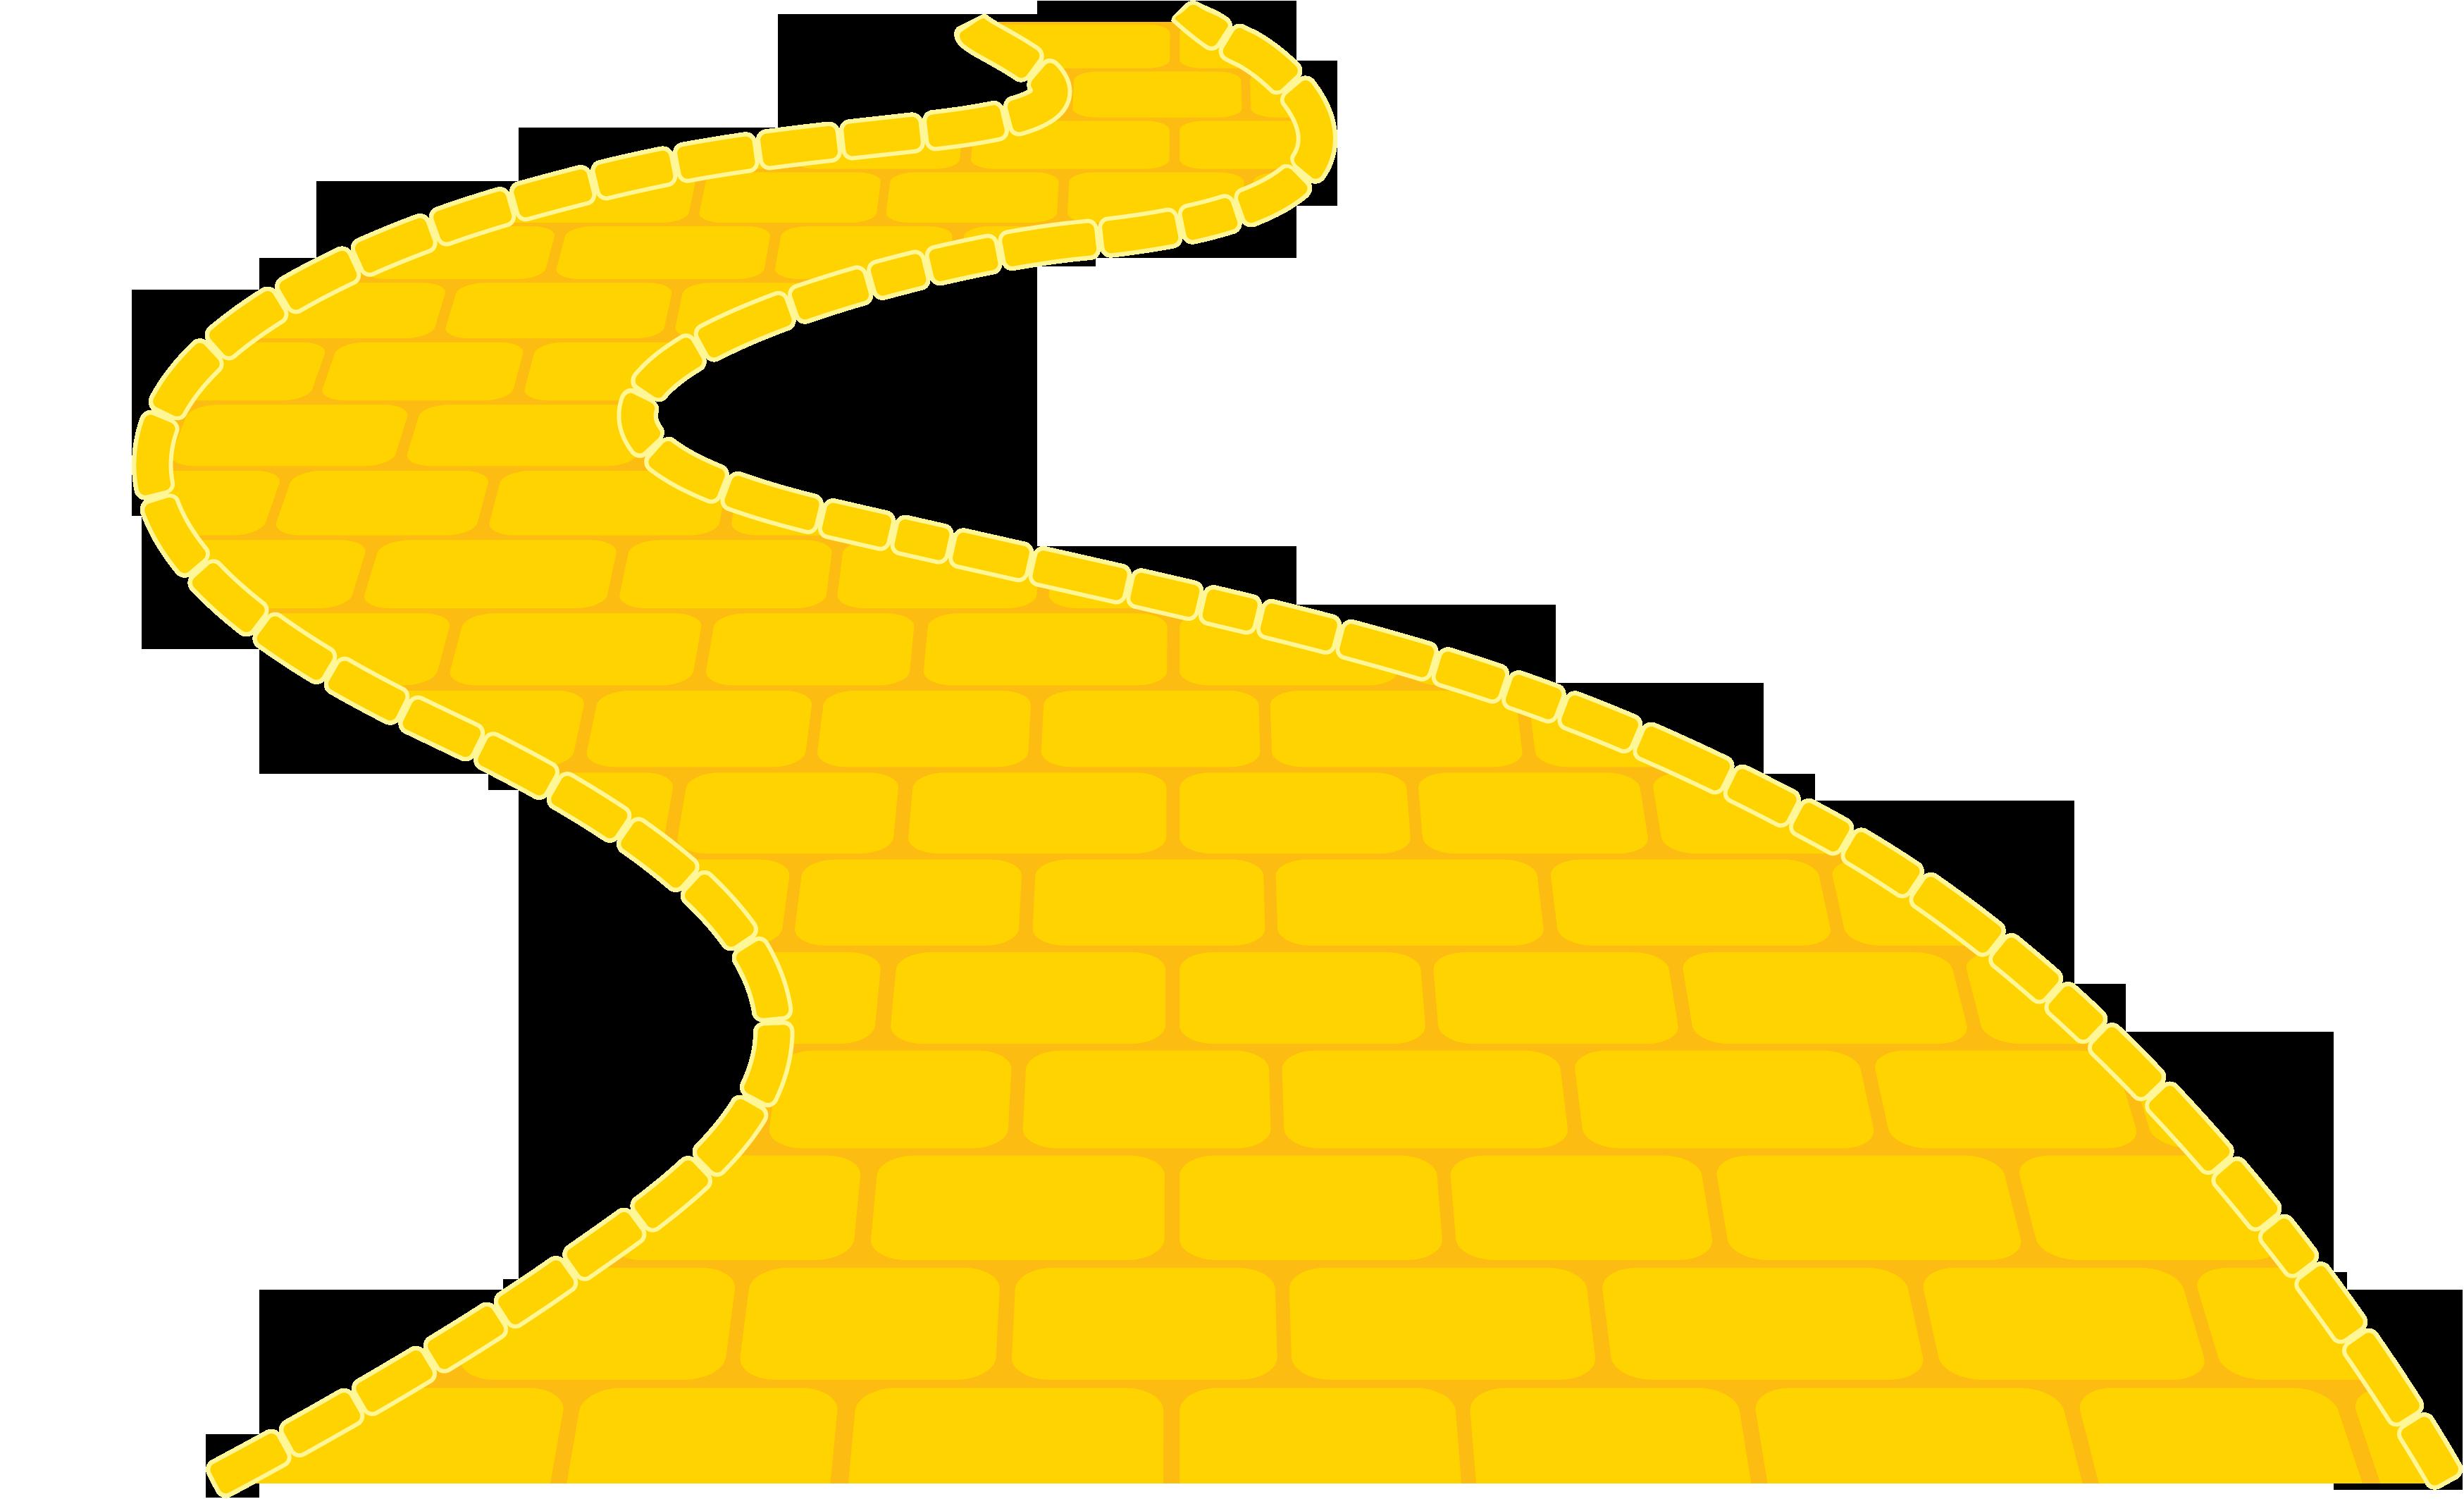 The Wizard Yellow brick road Clip art.